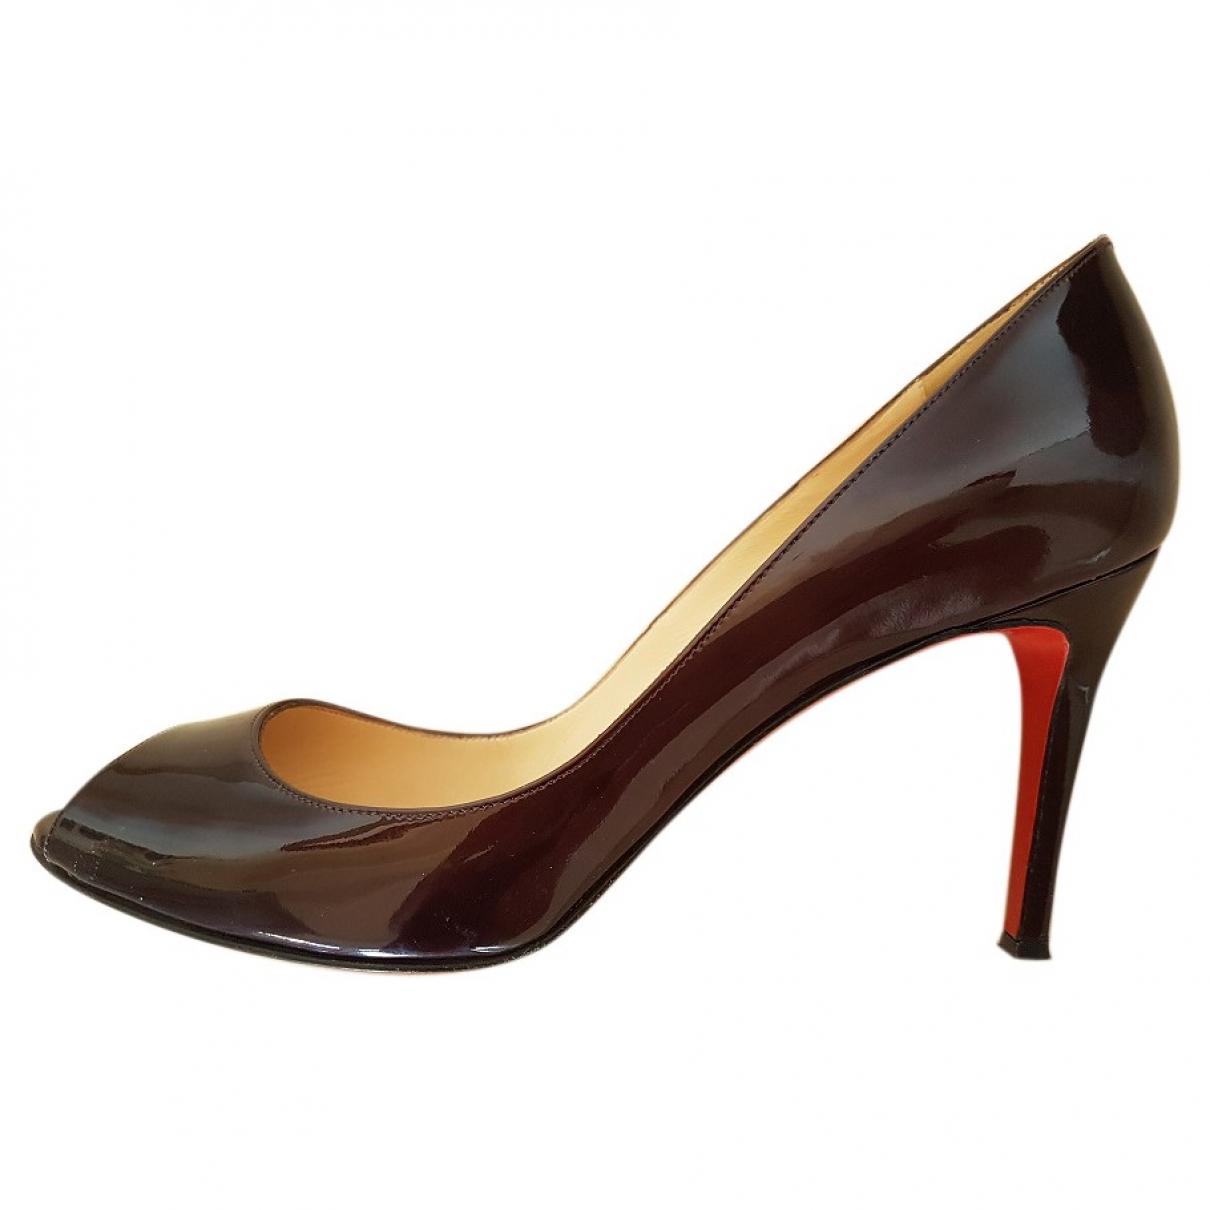 Christian Louboutin \N Brown Patent leather Heels for Women 40 EU